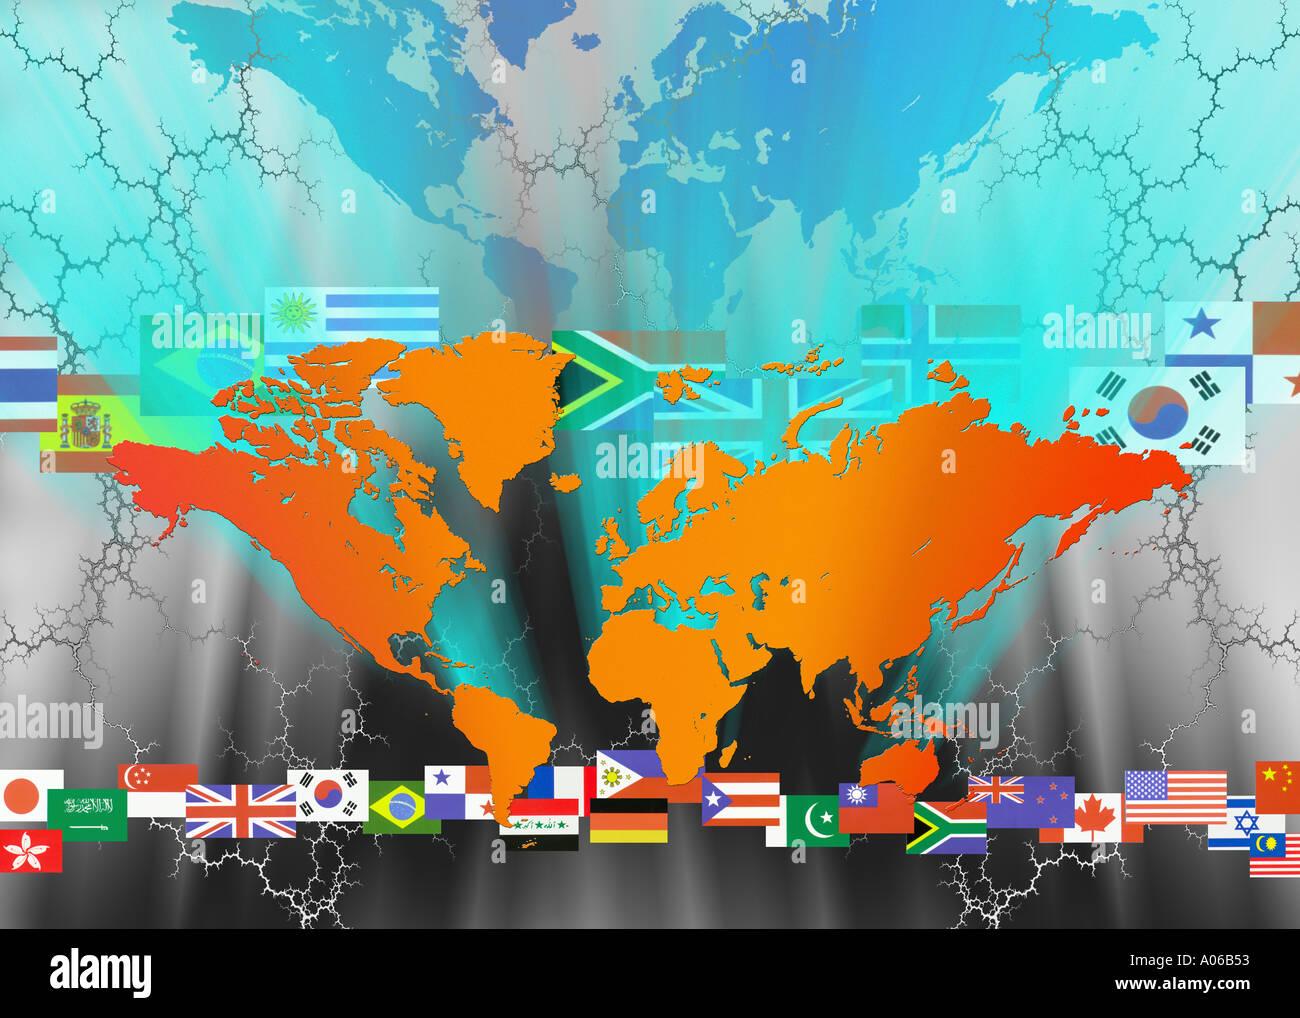 World flags stock photos world flags stock images alamy world map world flags stock image gumiabroncs Choice Image